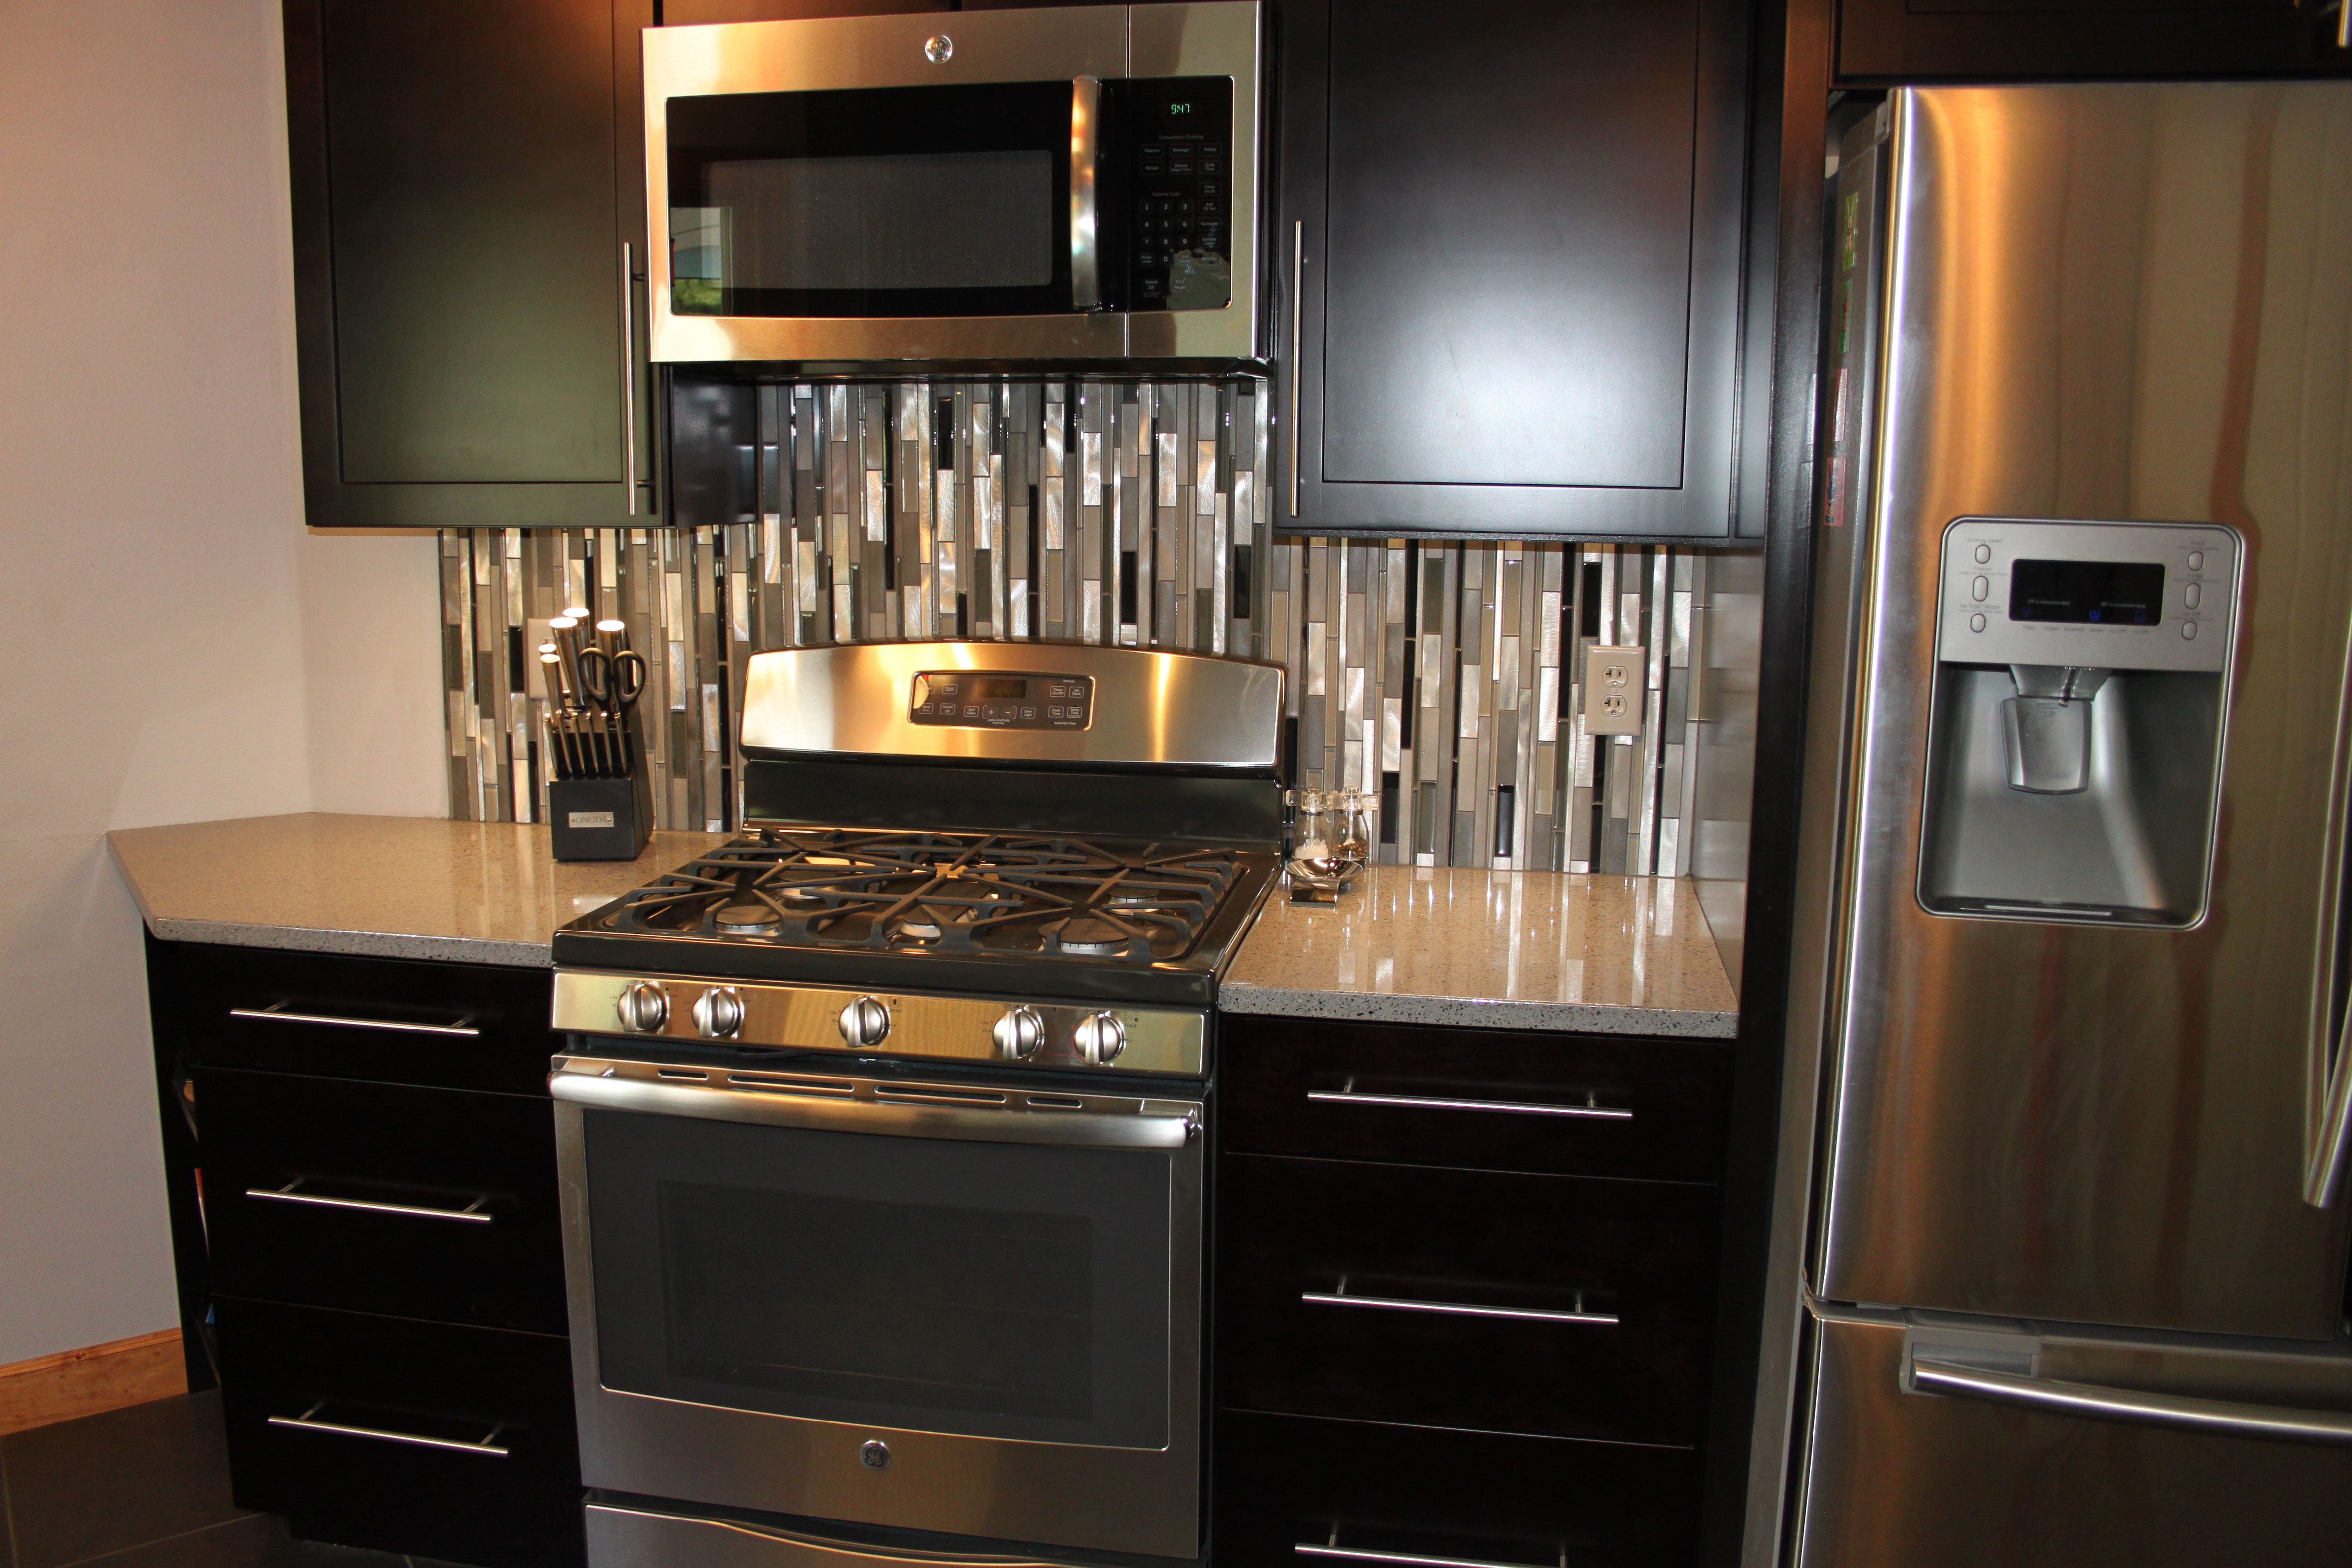 Waypoint Cabinetry Glazzio Glass Stainless Back Splash Silestone Countertops Blanco Sink Custom Kitchen Remodel Kitchen Remodel Design Silestone Countertops